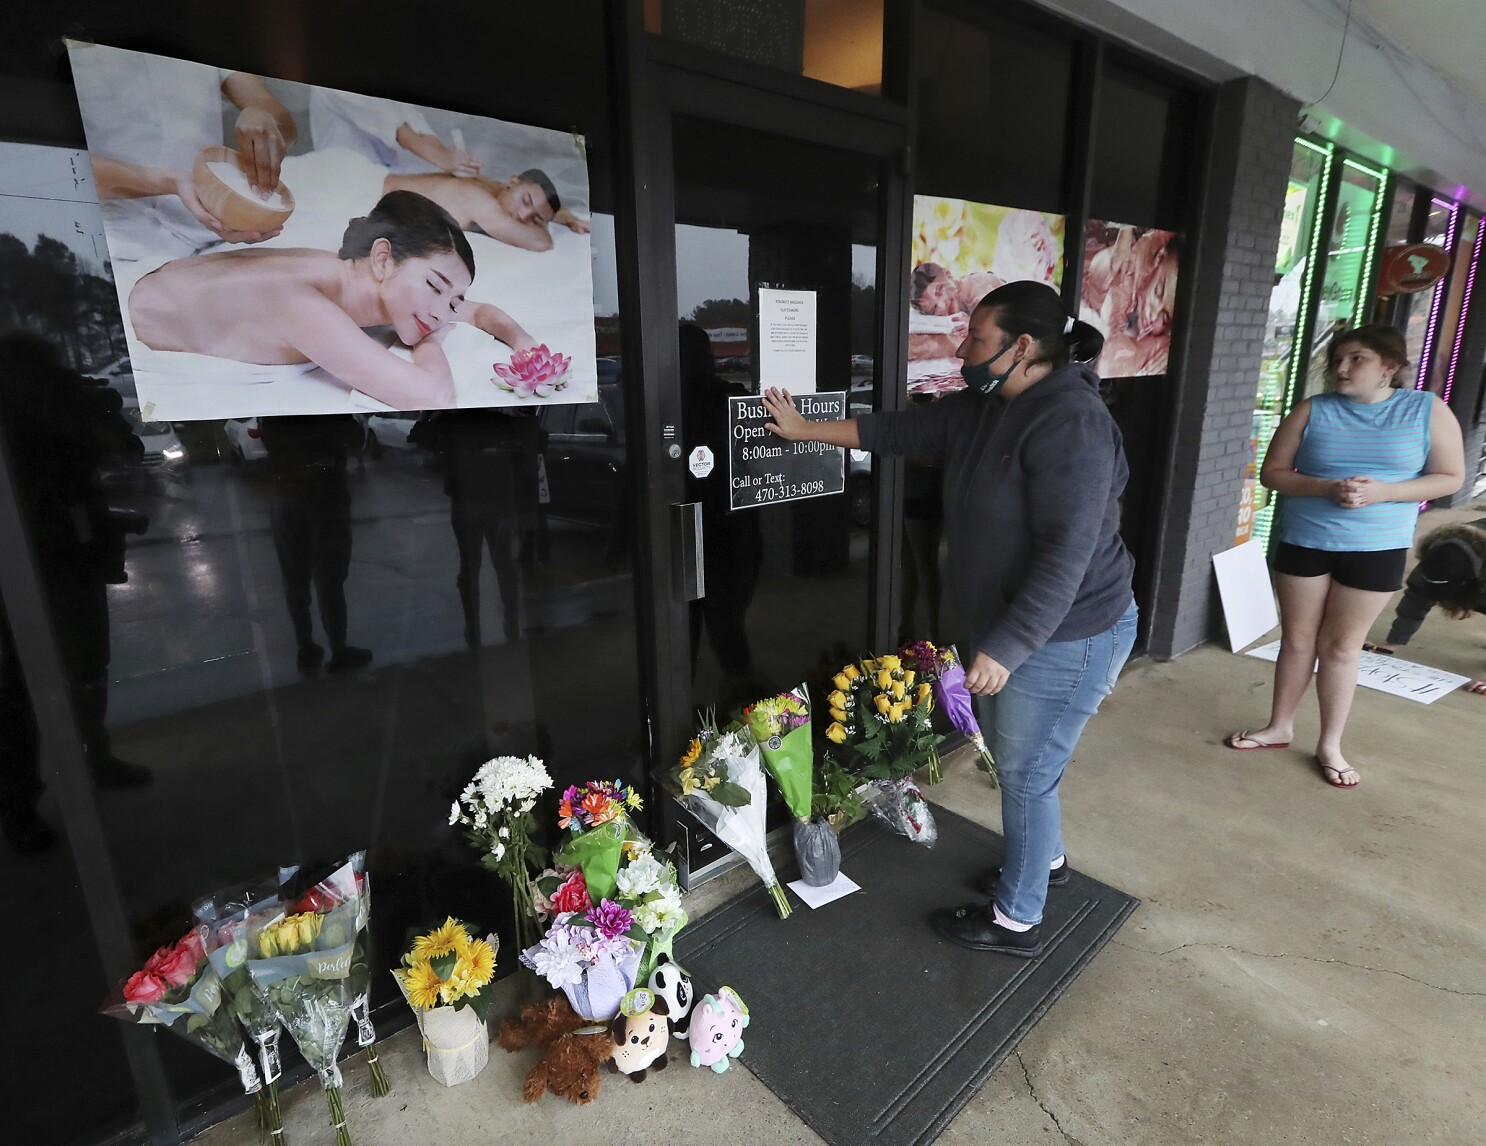 Atlanta shootings stir fear amid rise in anti-Asian hate crimes - Los  Angeles Times